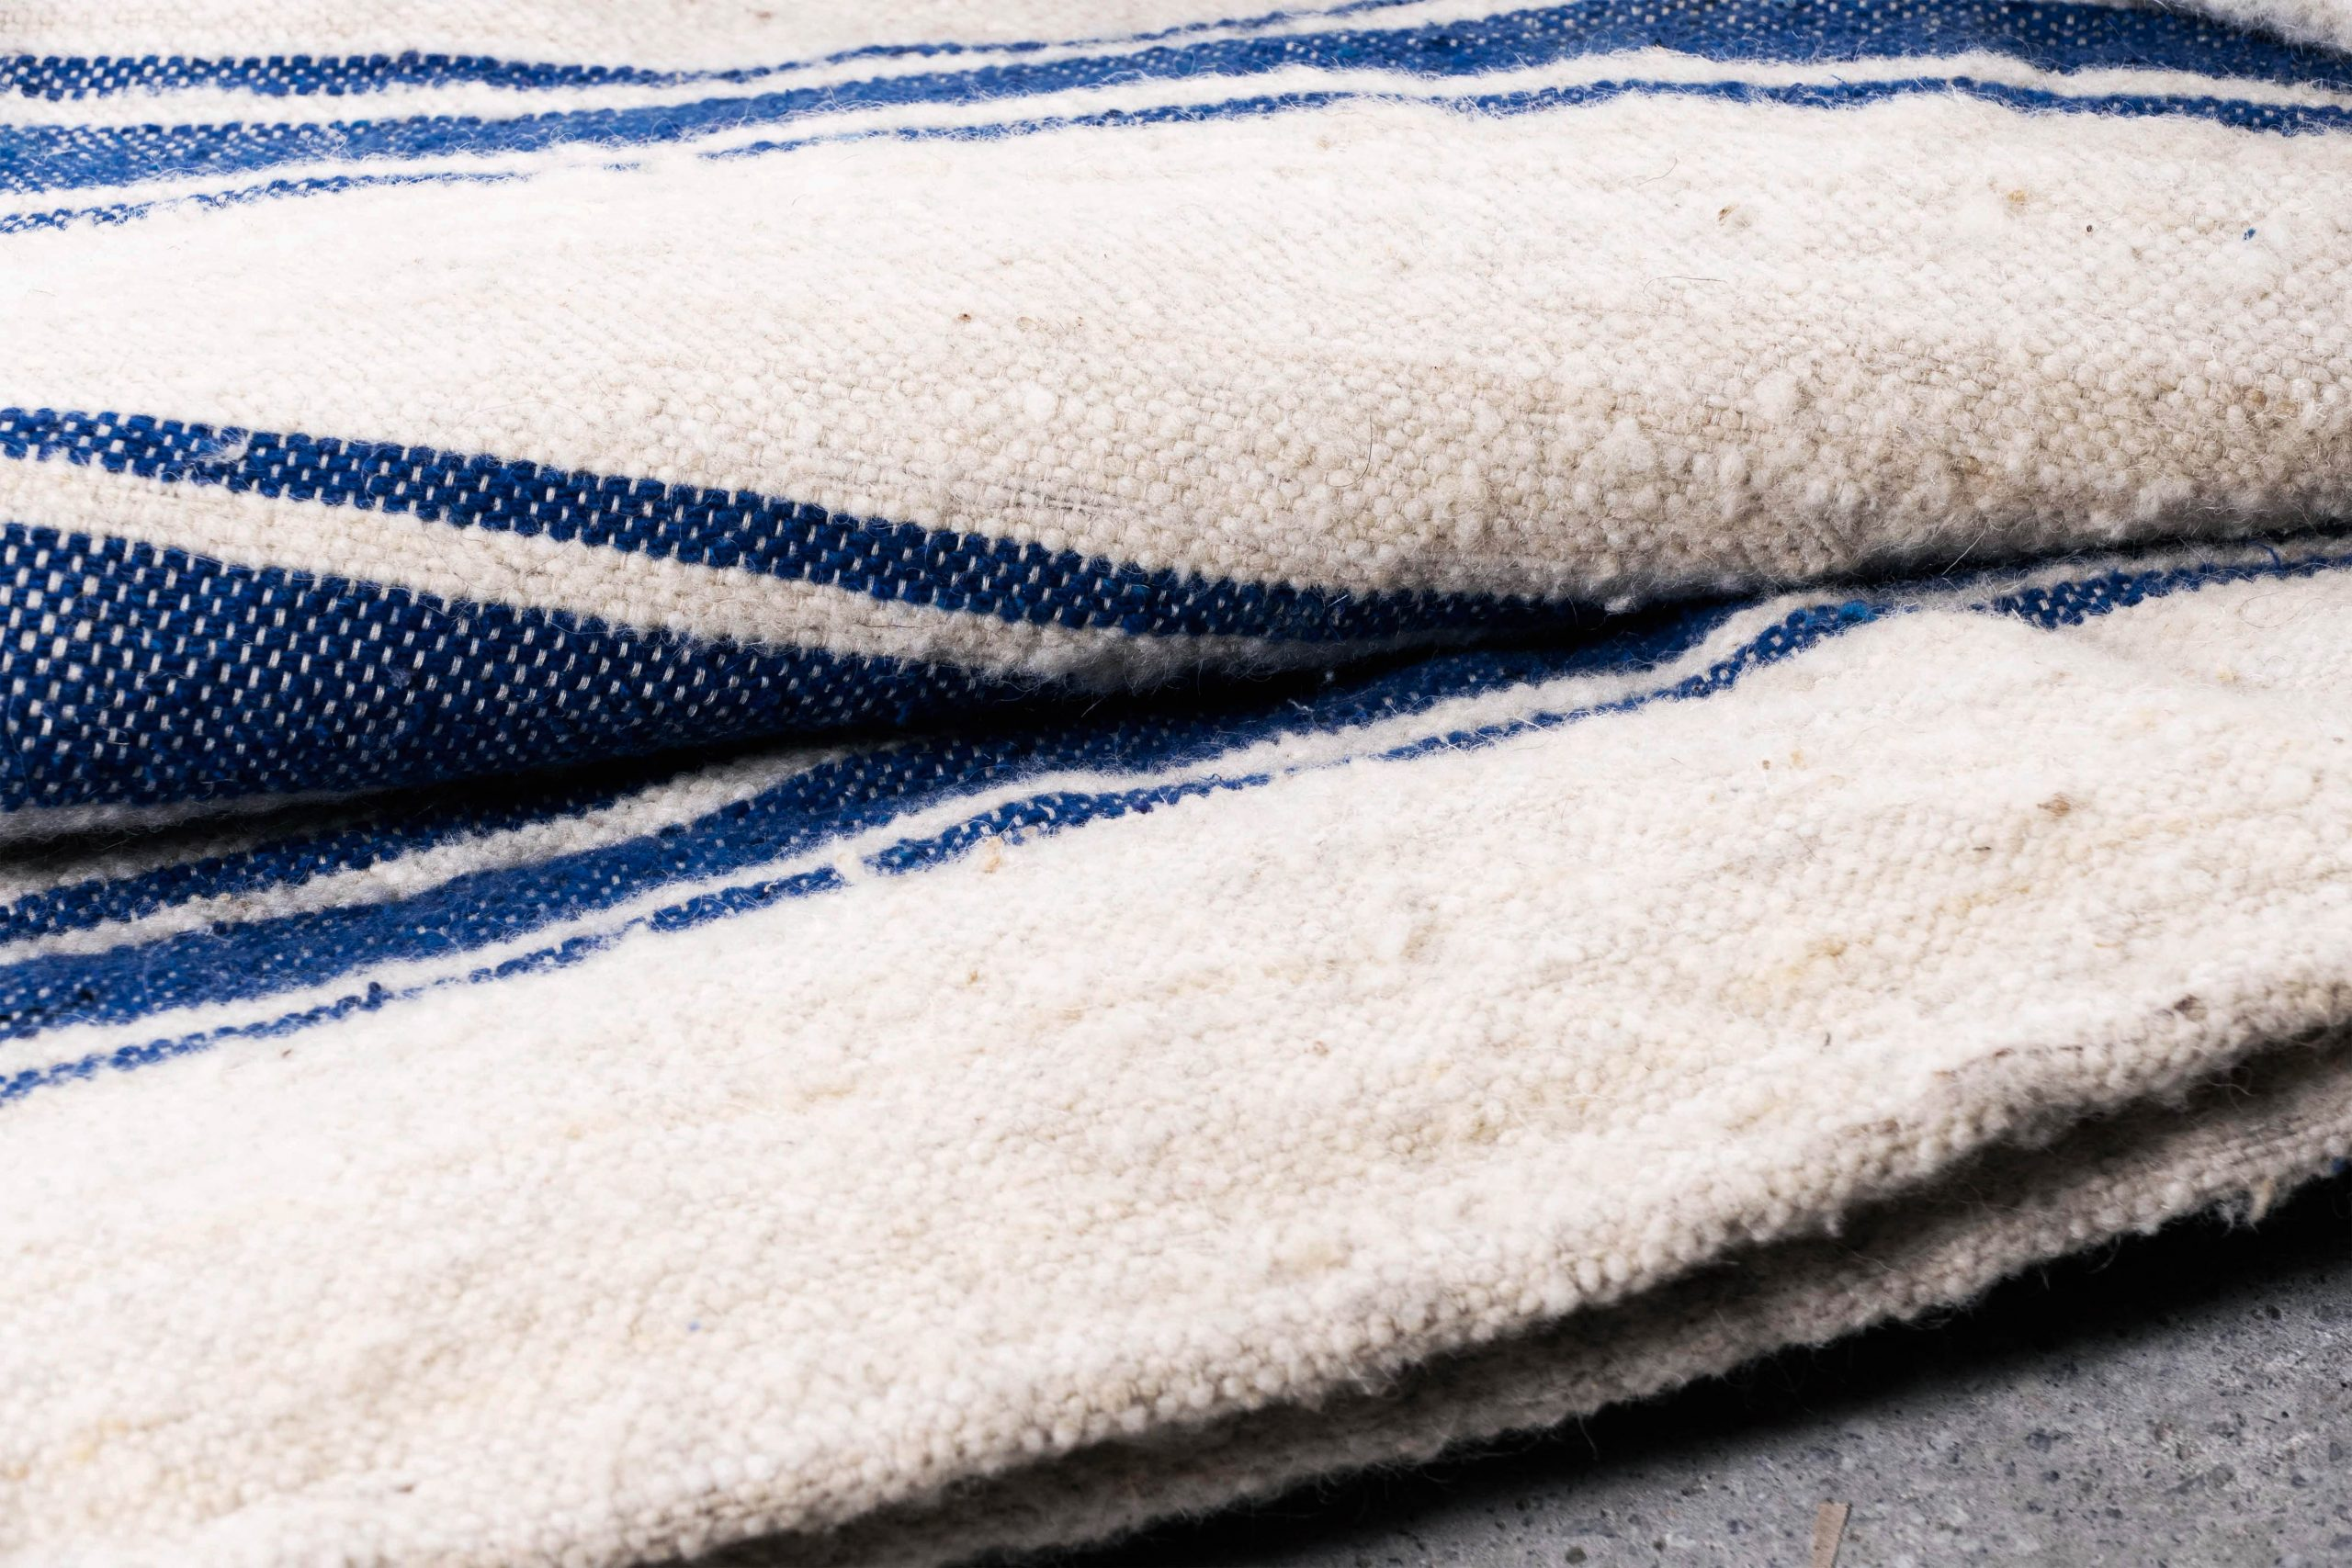 alfombra pepita lana azul marroqui de color azul